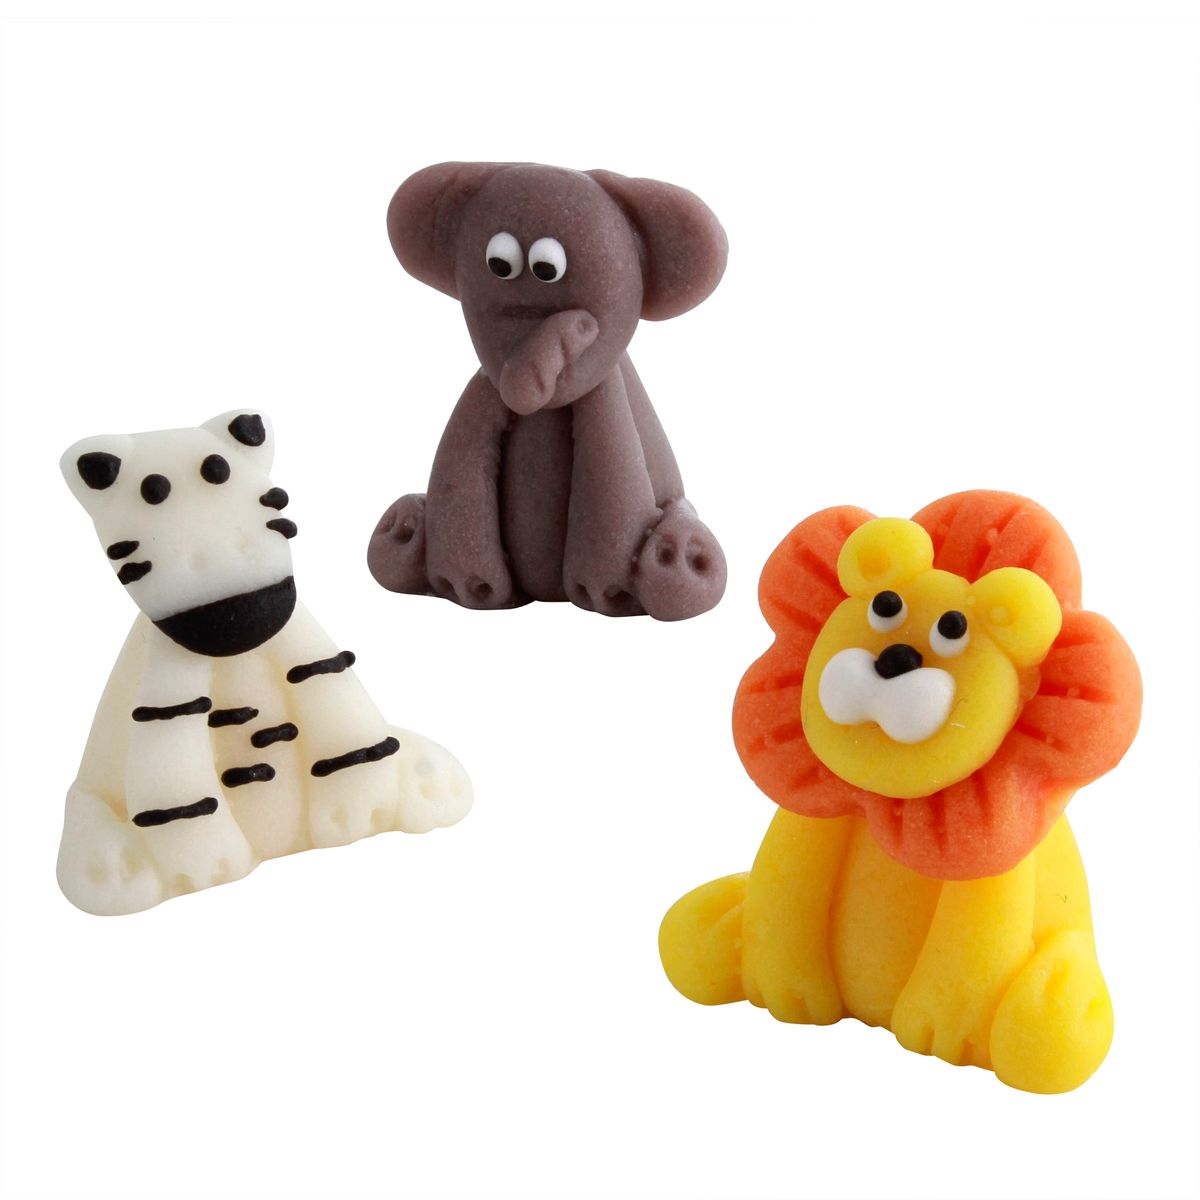 3 figurines 3D animaux - Alice Délice